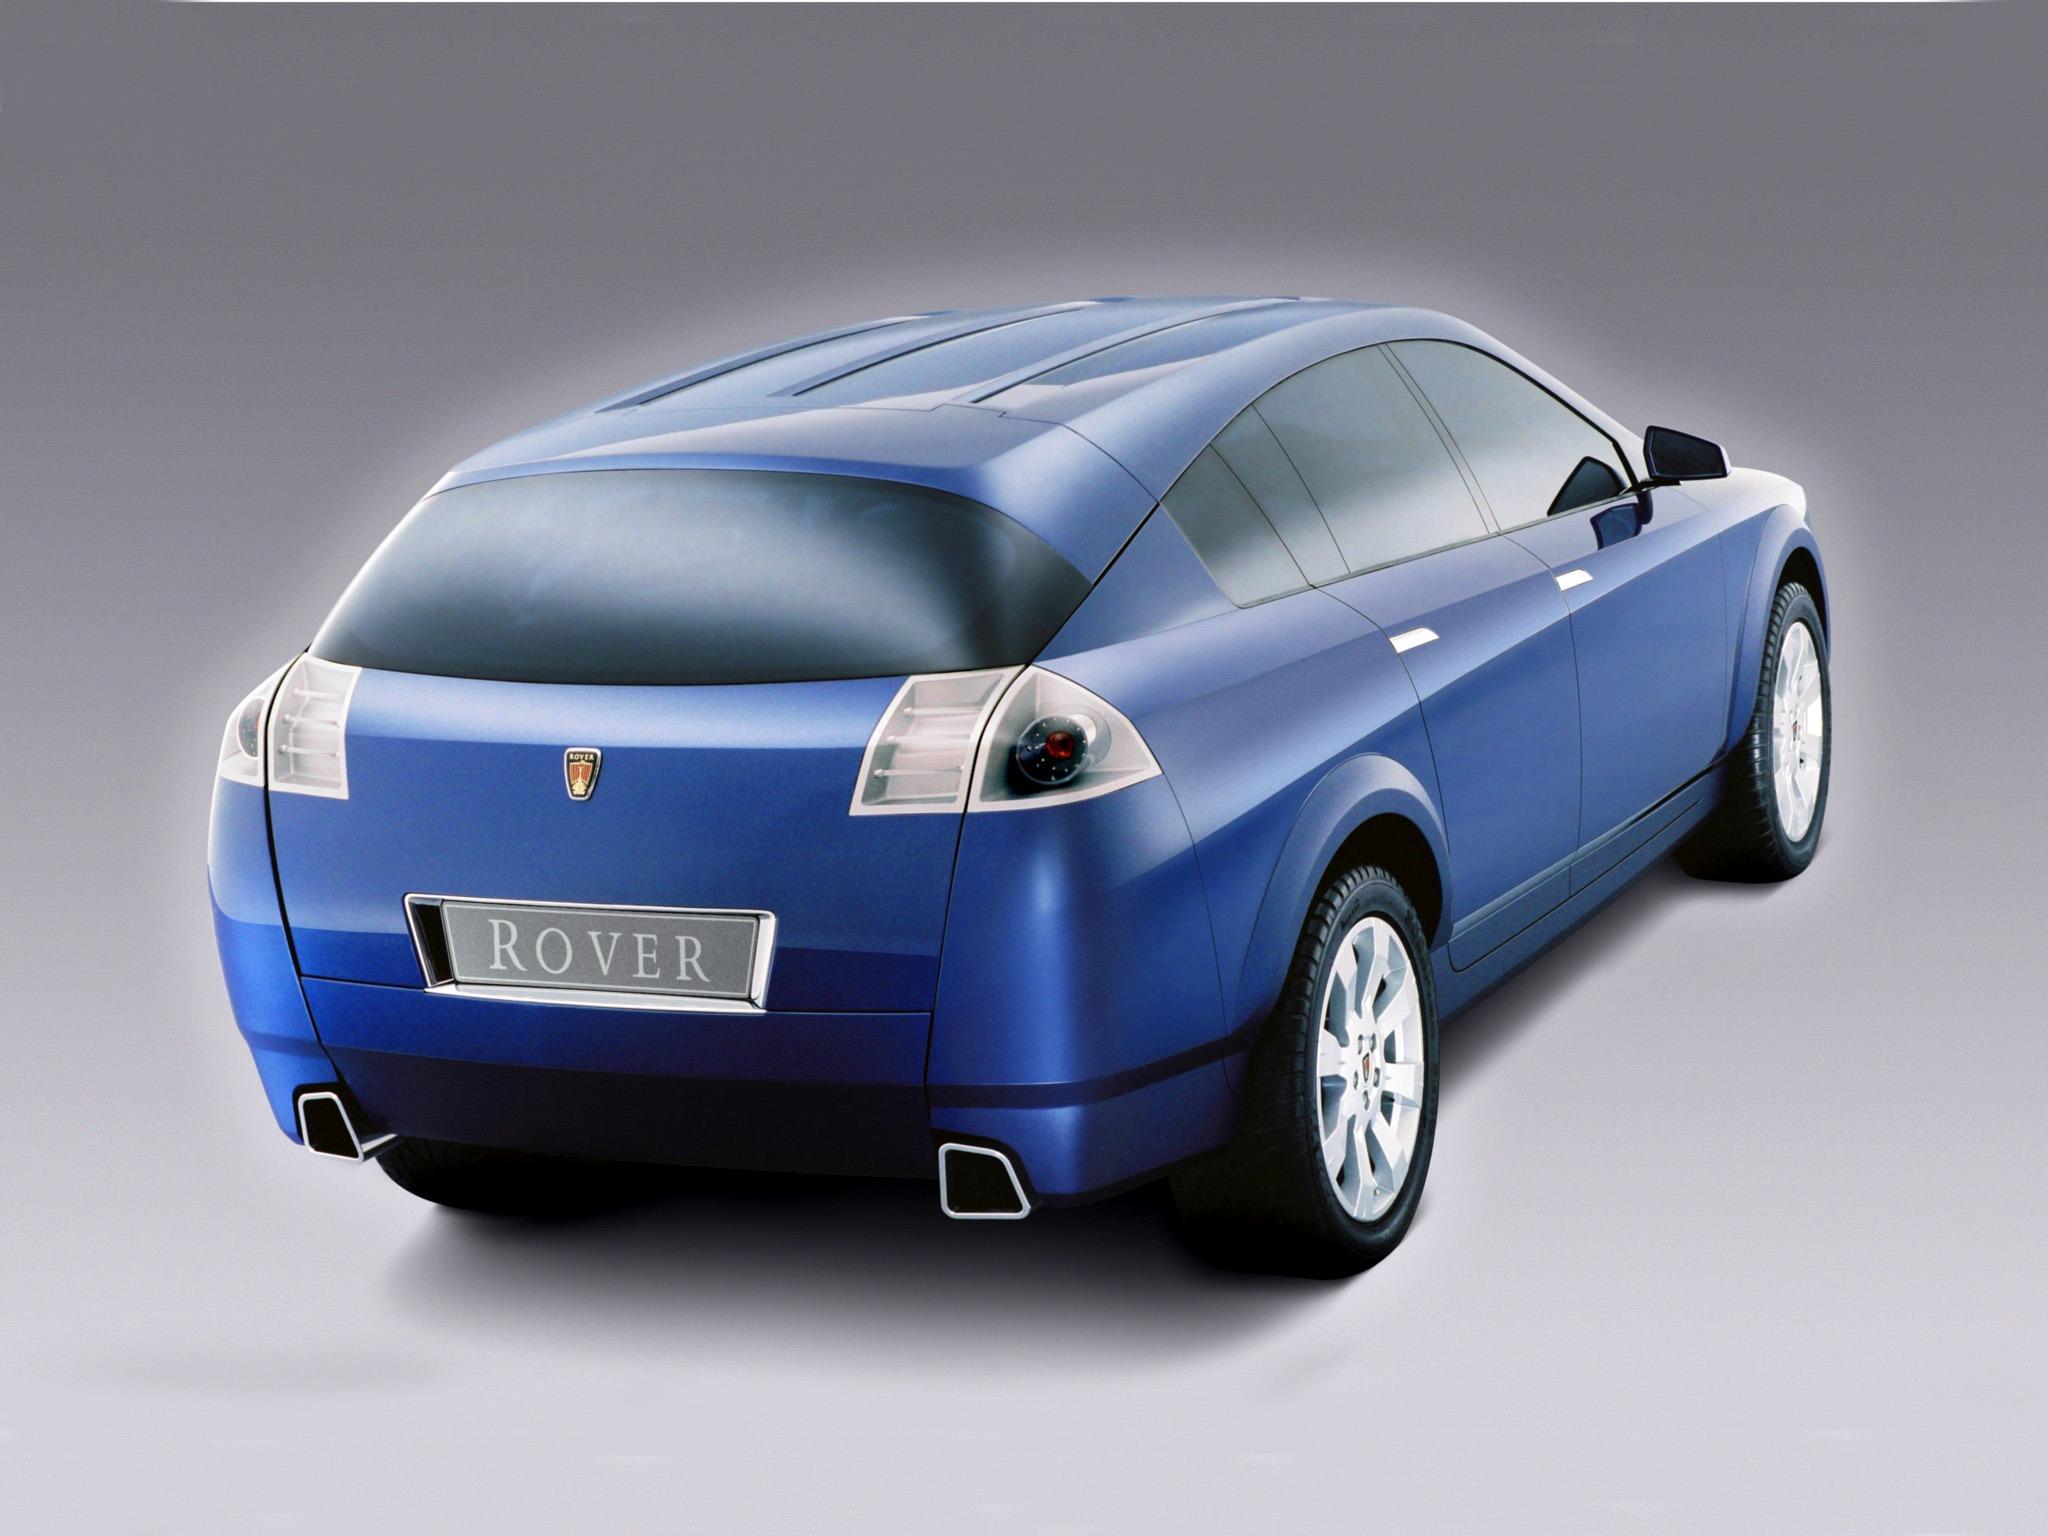 Rover TCV Concept (2002)